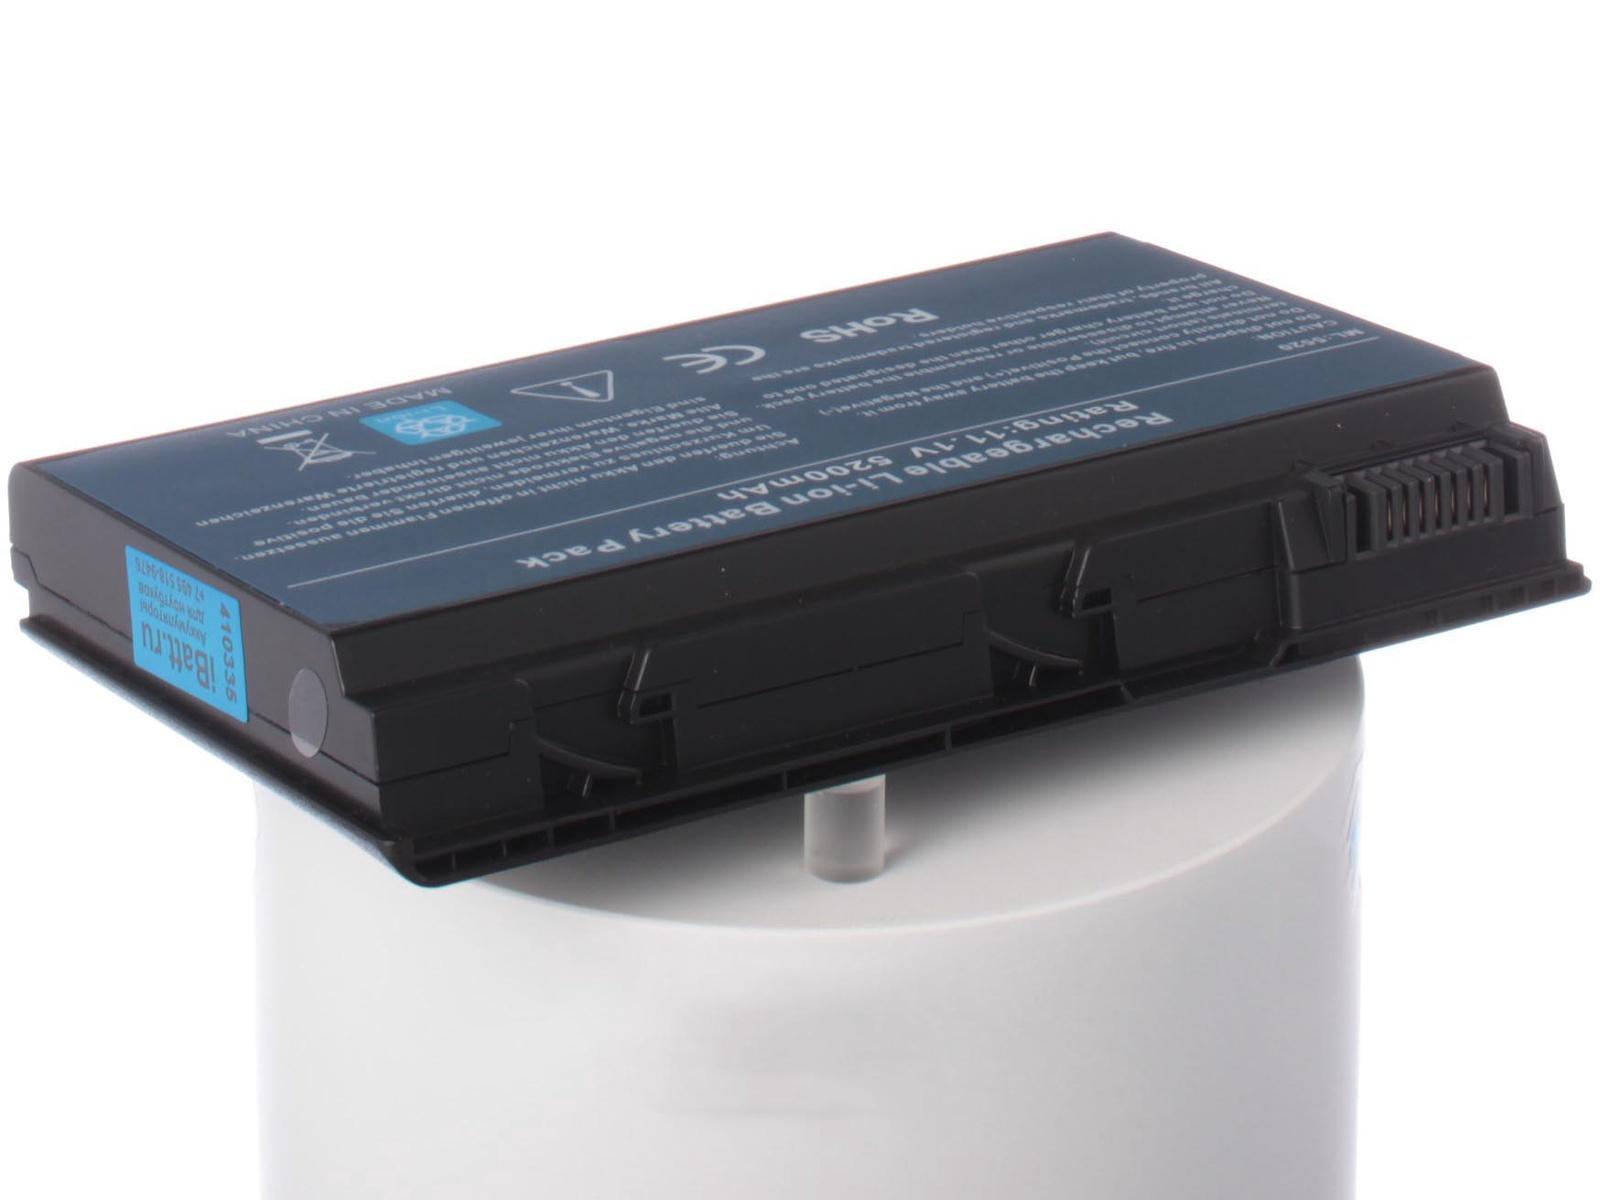 Аккумулятор для ноутбука iBatt для Acer Extensa 7220, TravelMate 7720G, TravelMate 6592G, TravelMate 6460, Extensa 5420, Extensa 5620-1A1G16Mi, TravelMate 7720, Extensa 5520, Extensa 5430-622G16Mi, TravelMate 5310 цены